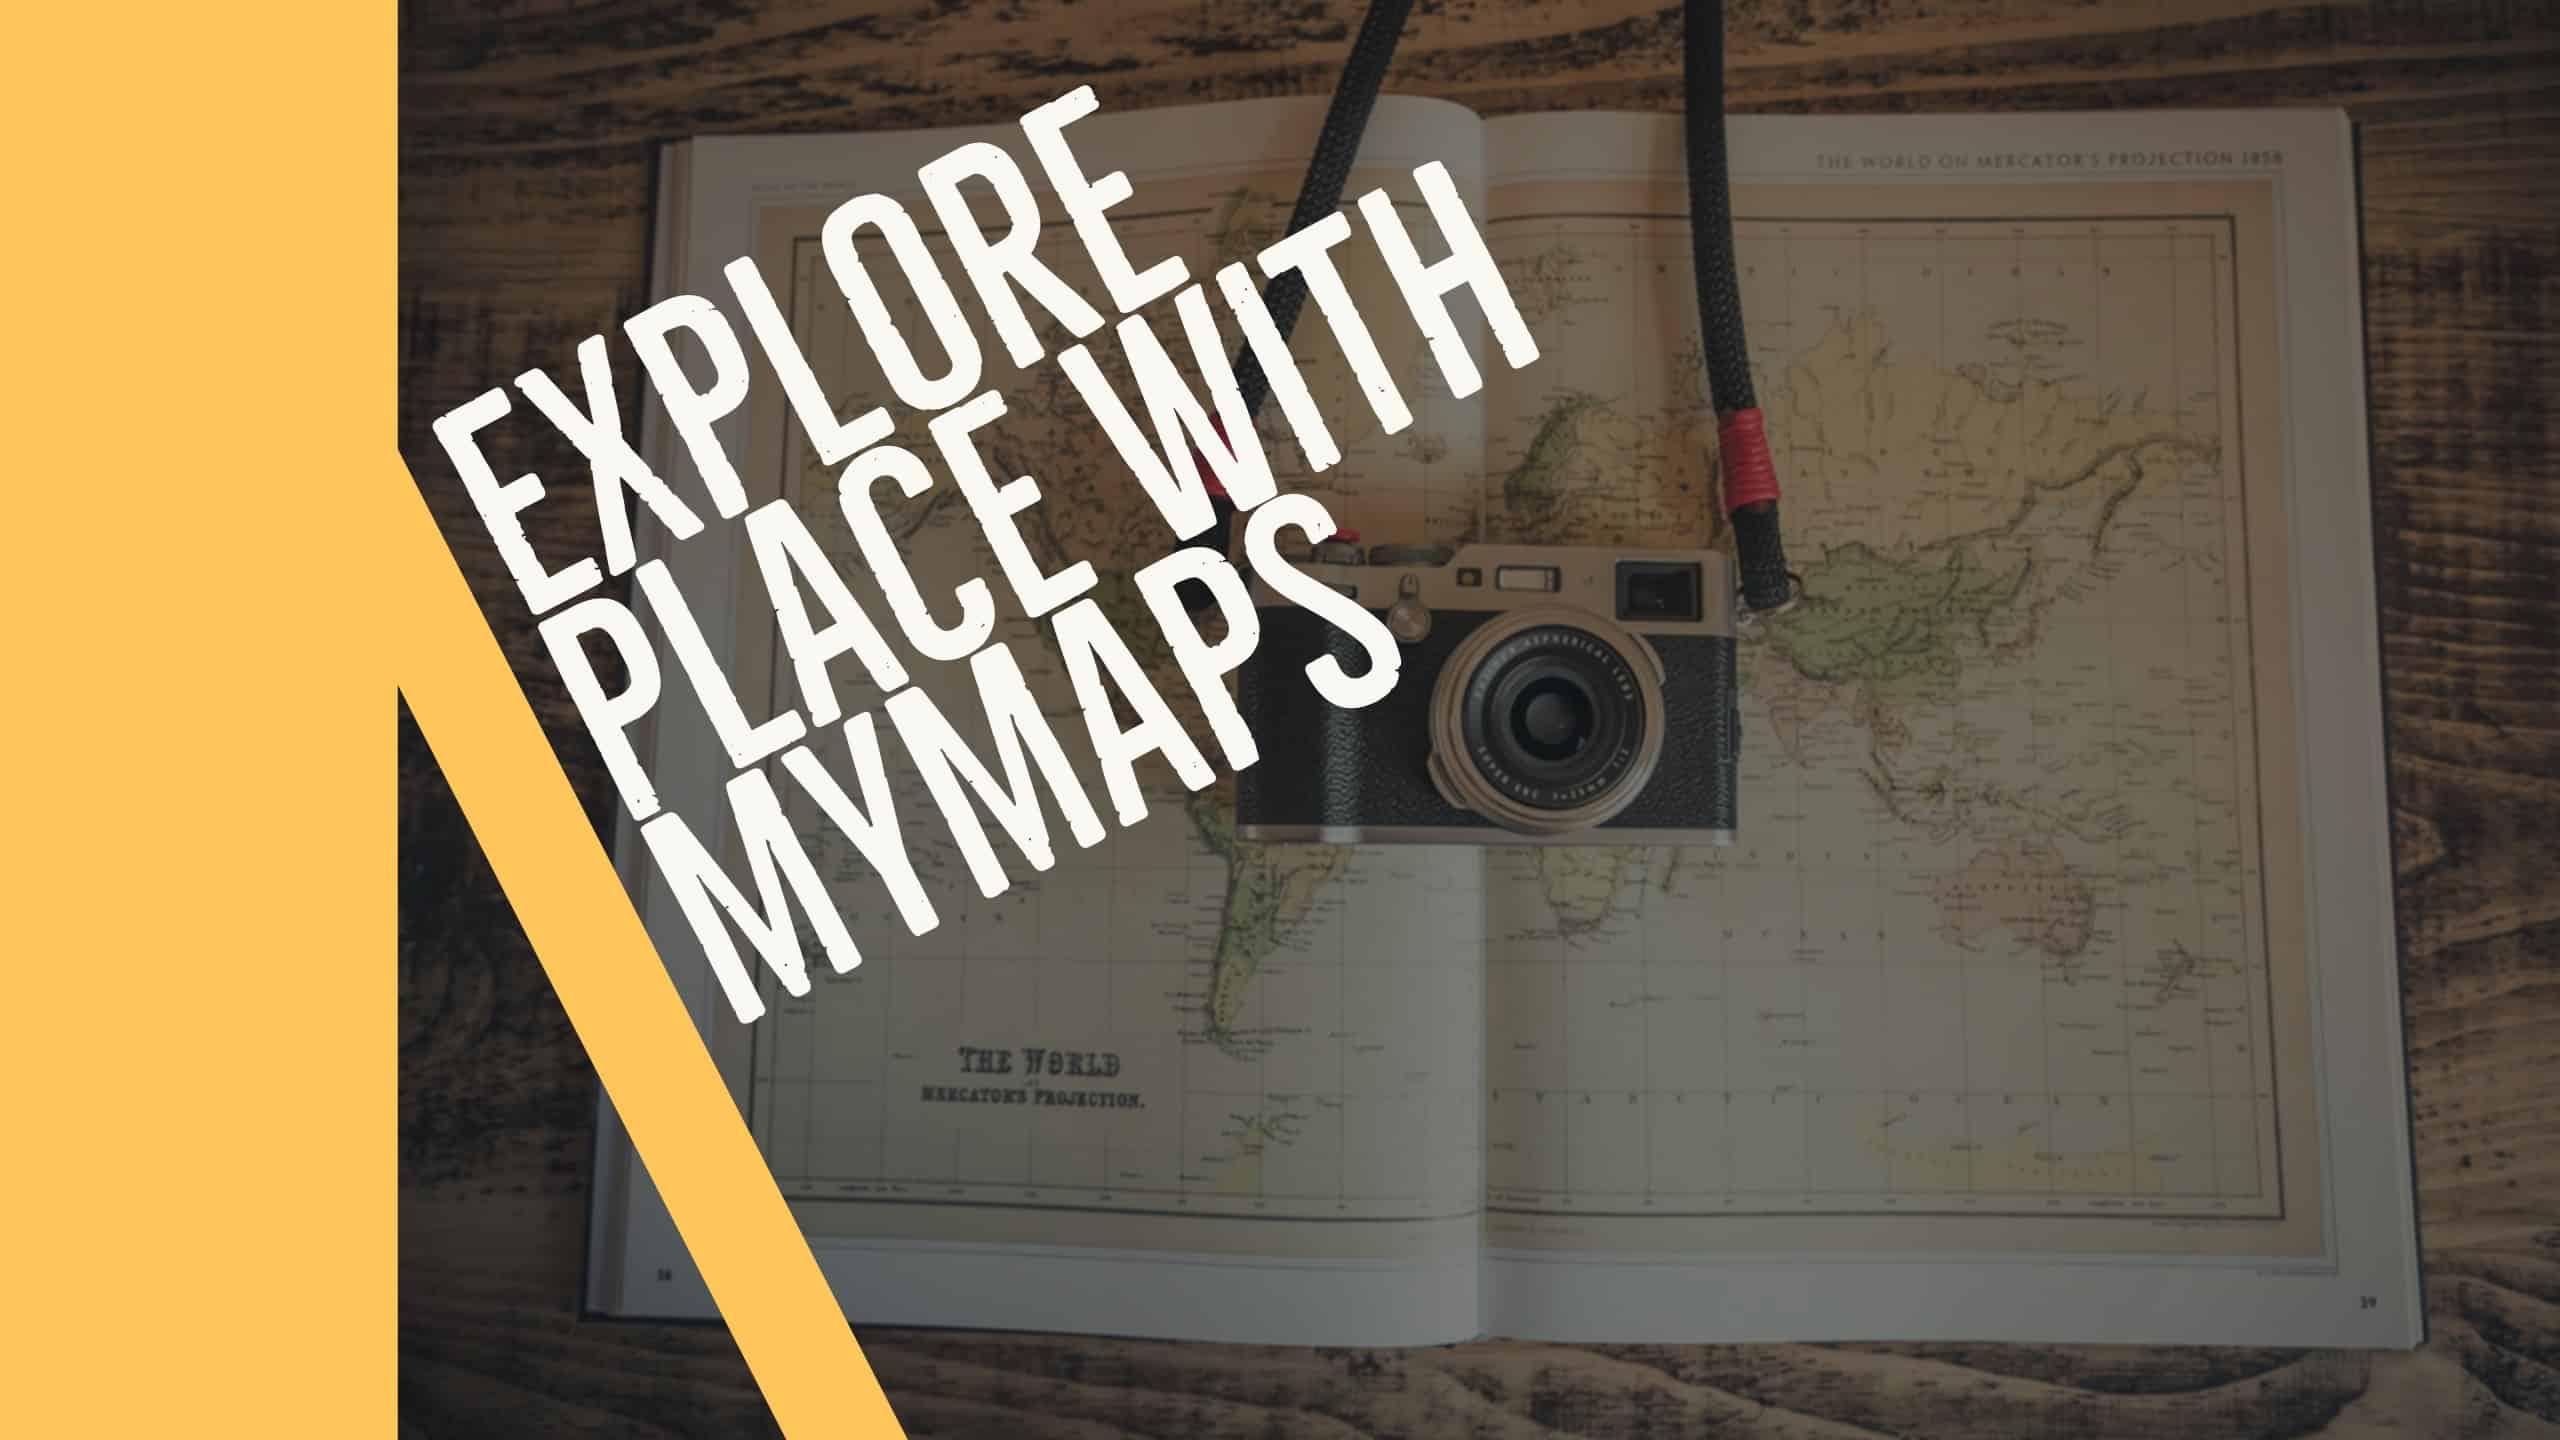 Explore Place with MyMaps